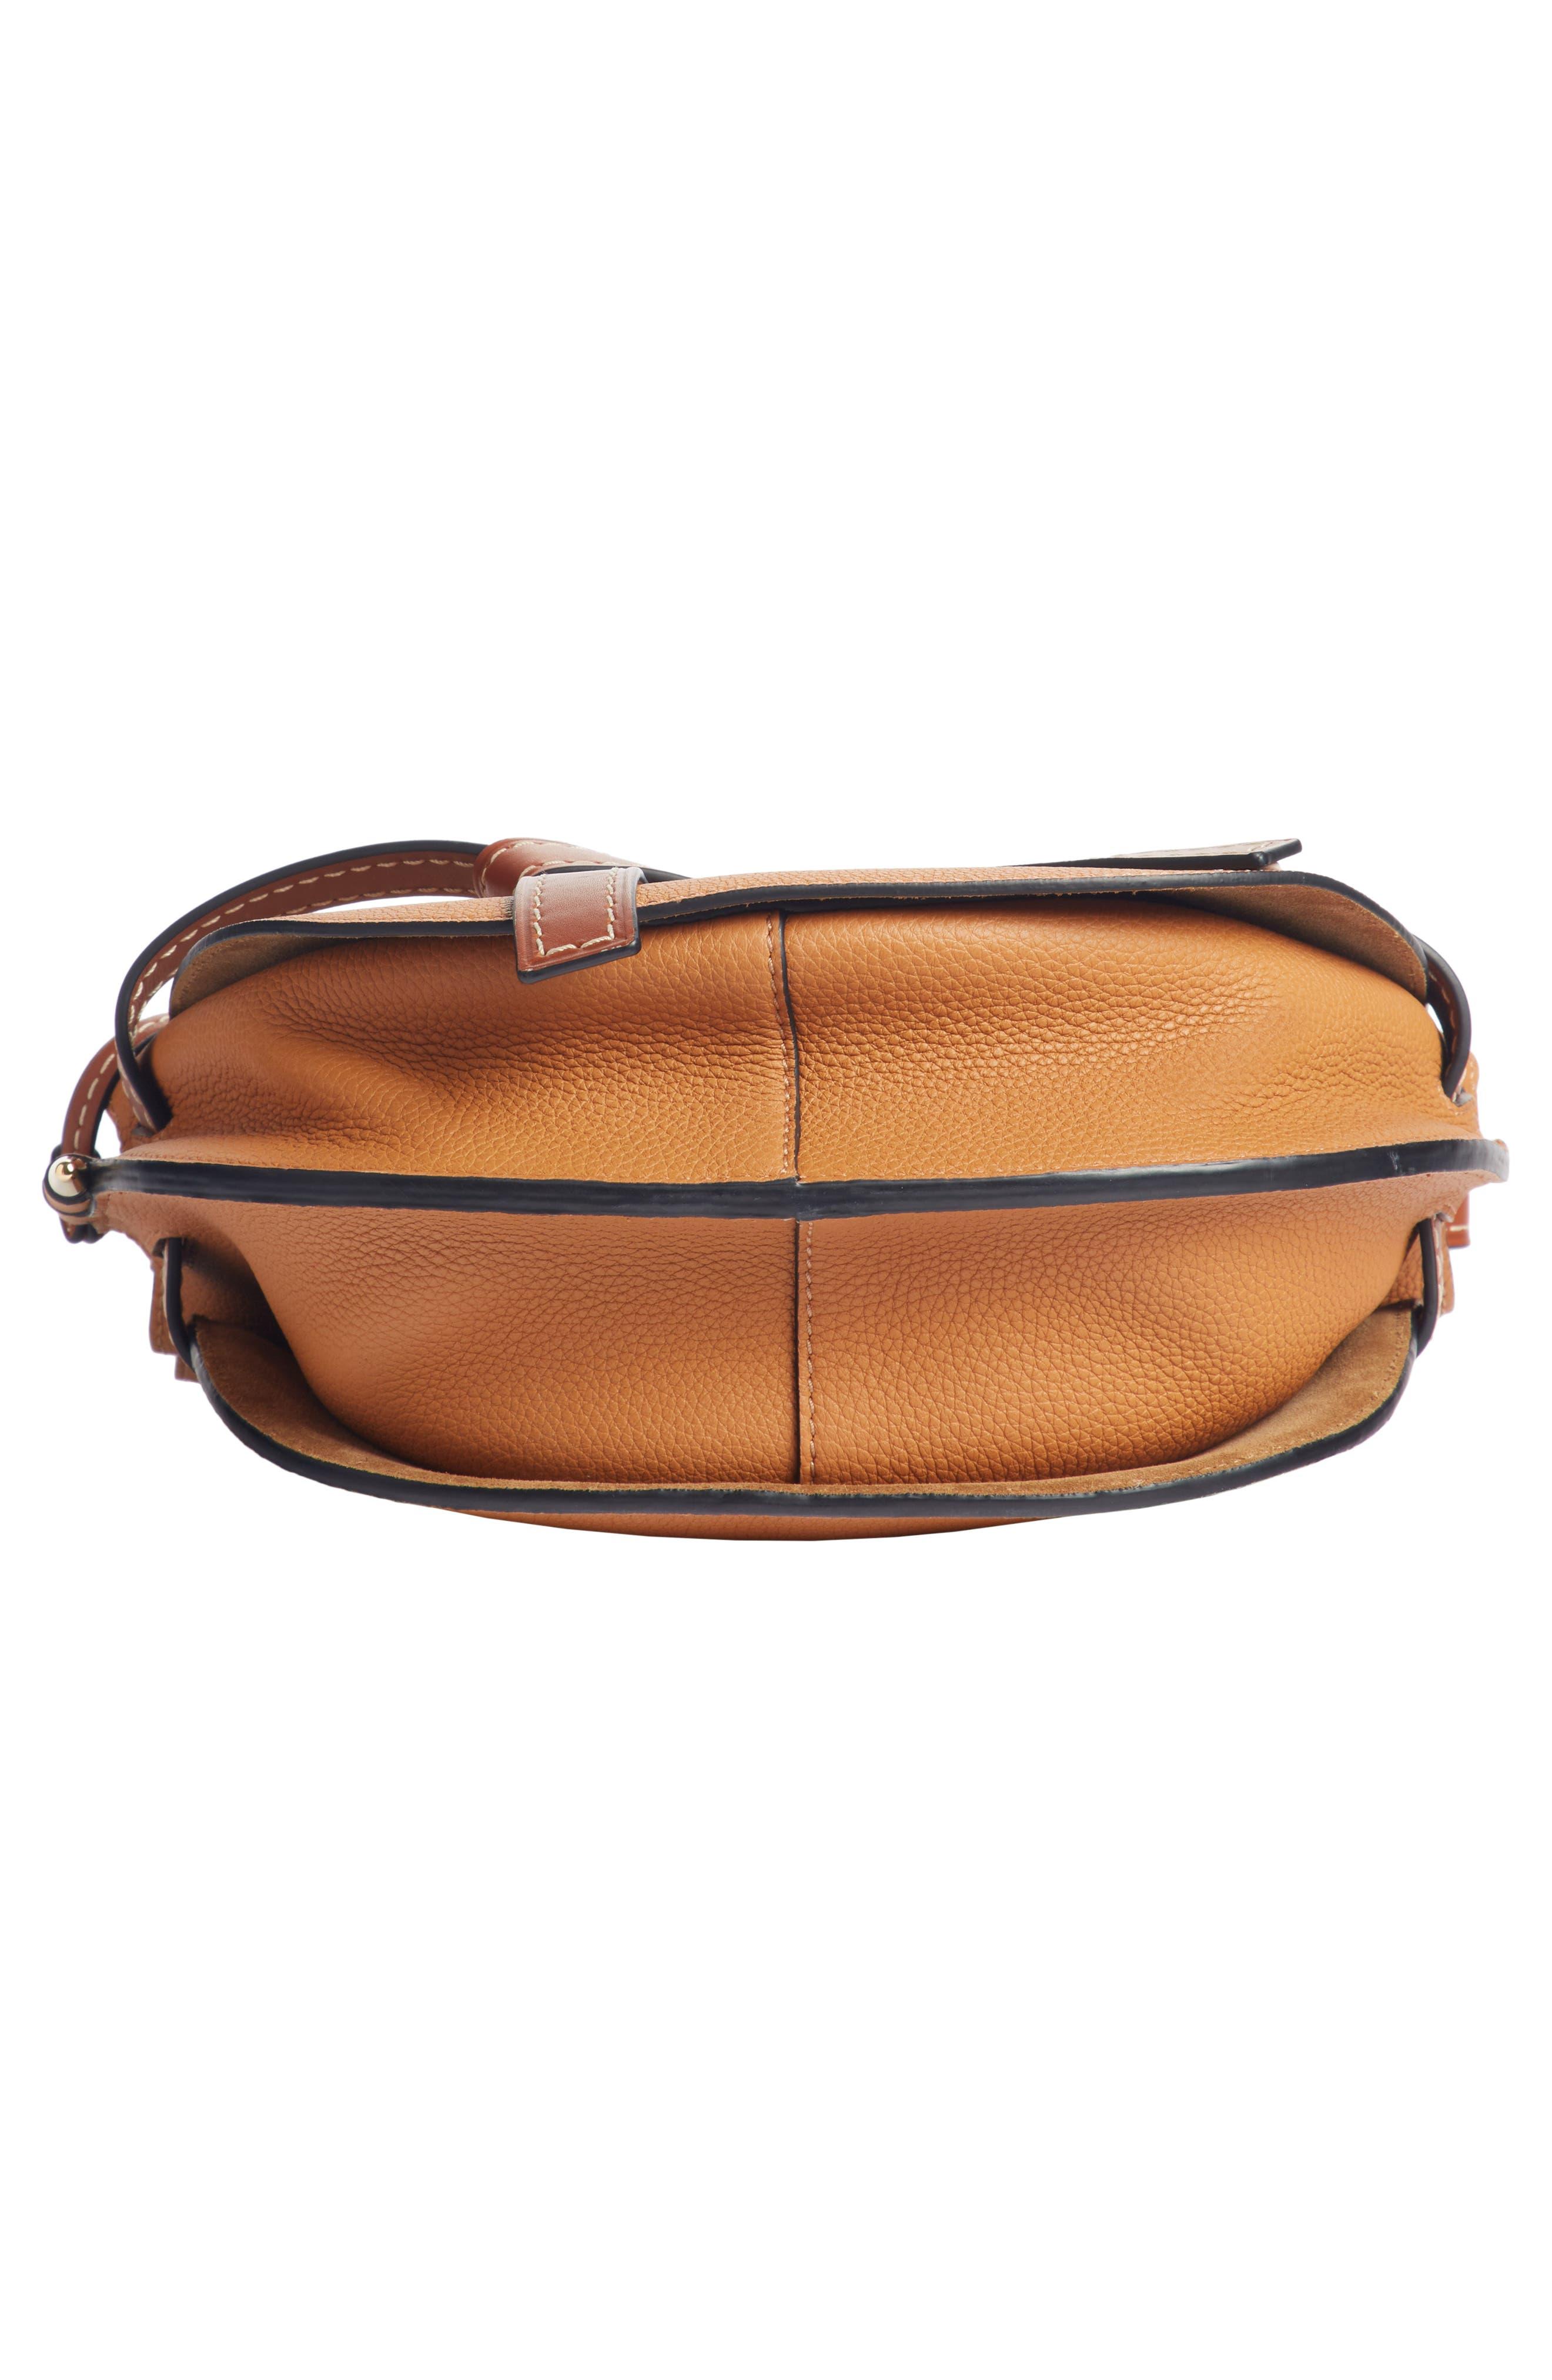 Small Gate Leather Crossbody Bag,                             Alternate thumbnail 5, color,                             LIGHT CARAMEL/ PECAN